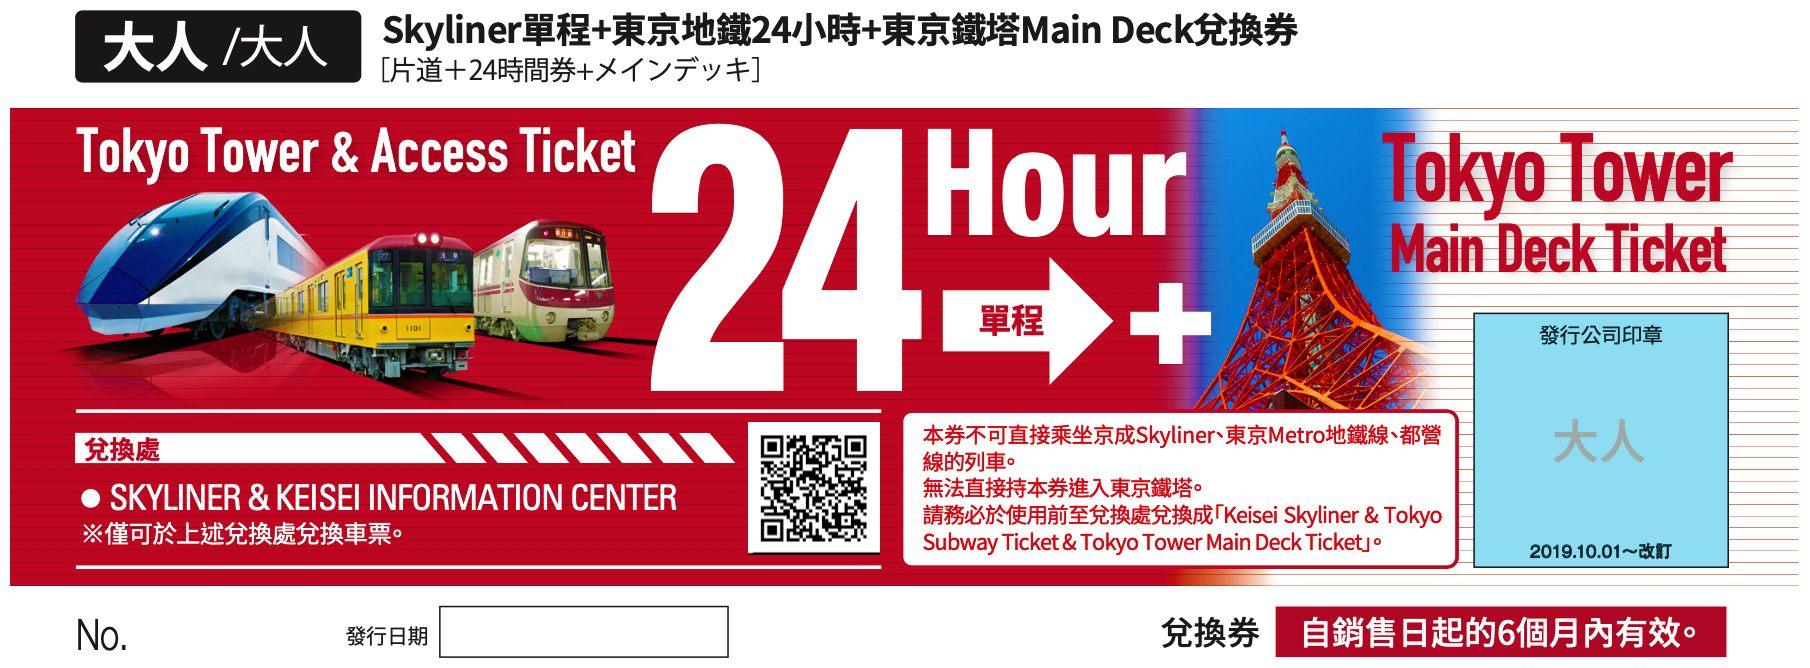 特別乘車券「Tokyo Tower & Access Ticket」